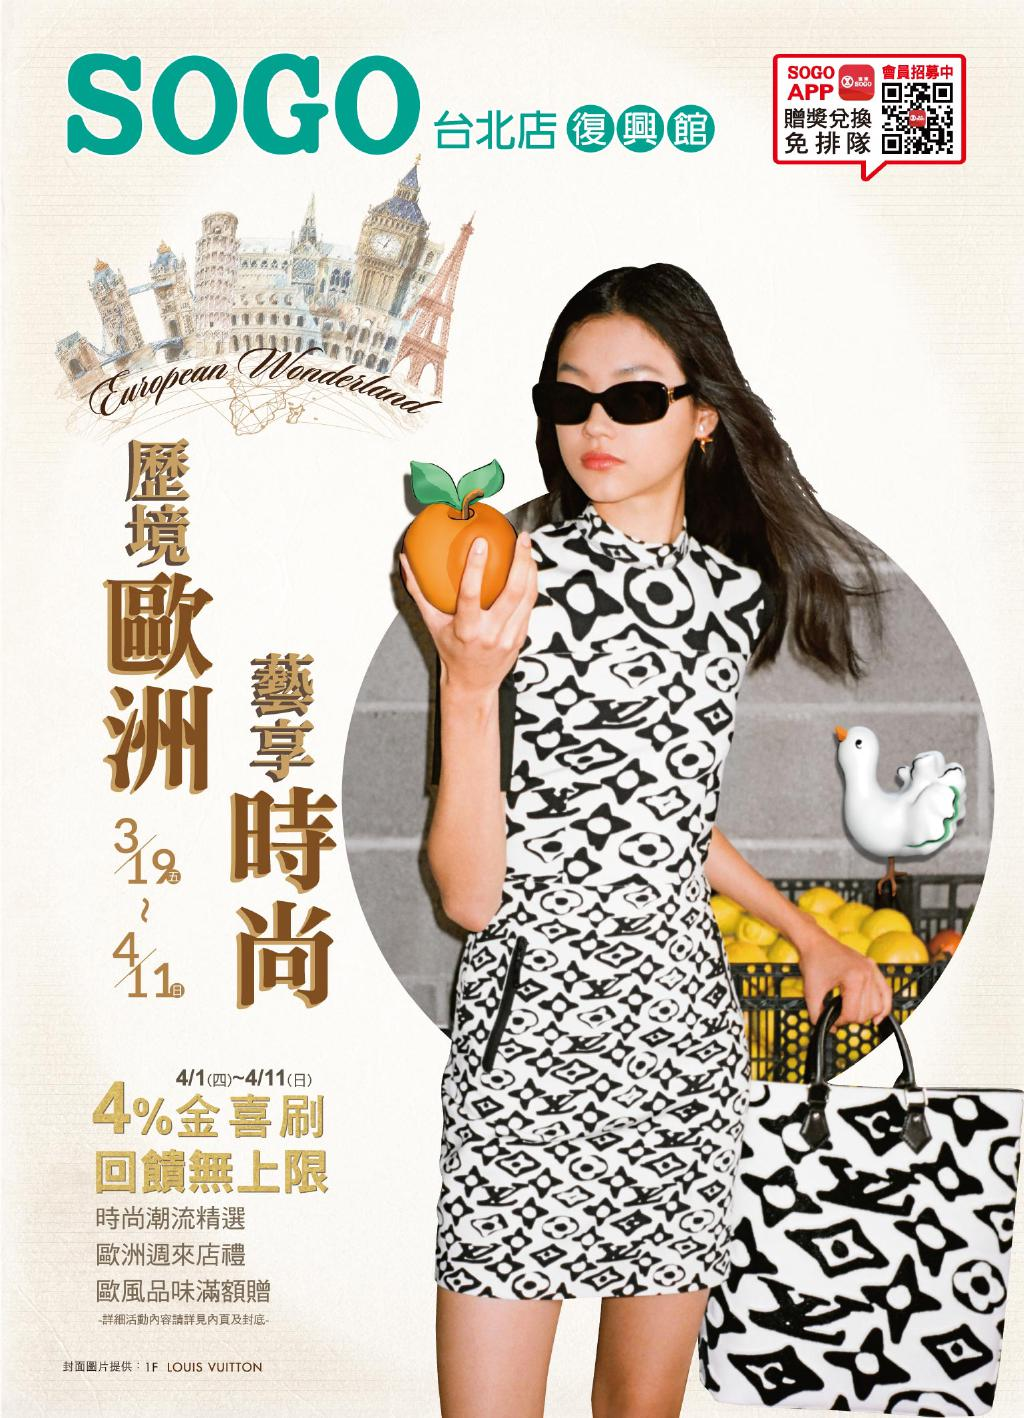 SOGO《台北復興館》「歷境歐洲 藝享時尚 European Wonderland」【2021/4/11 止】